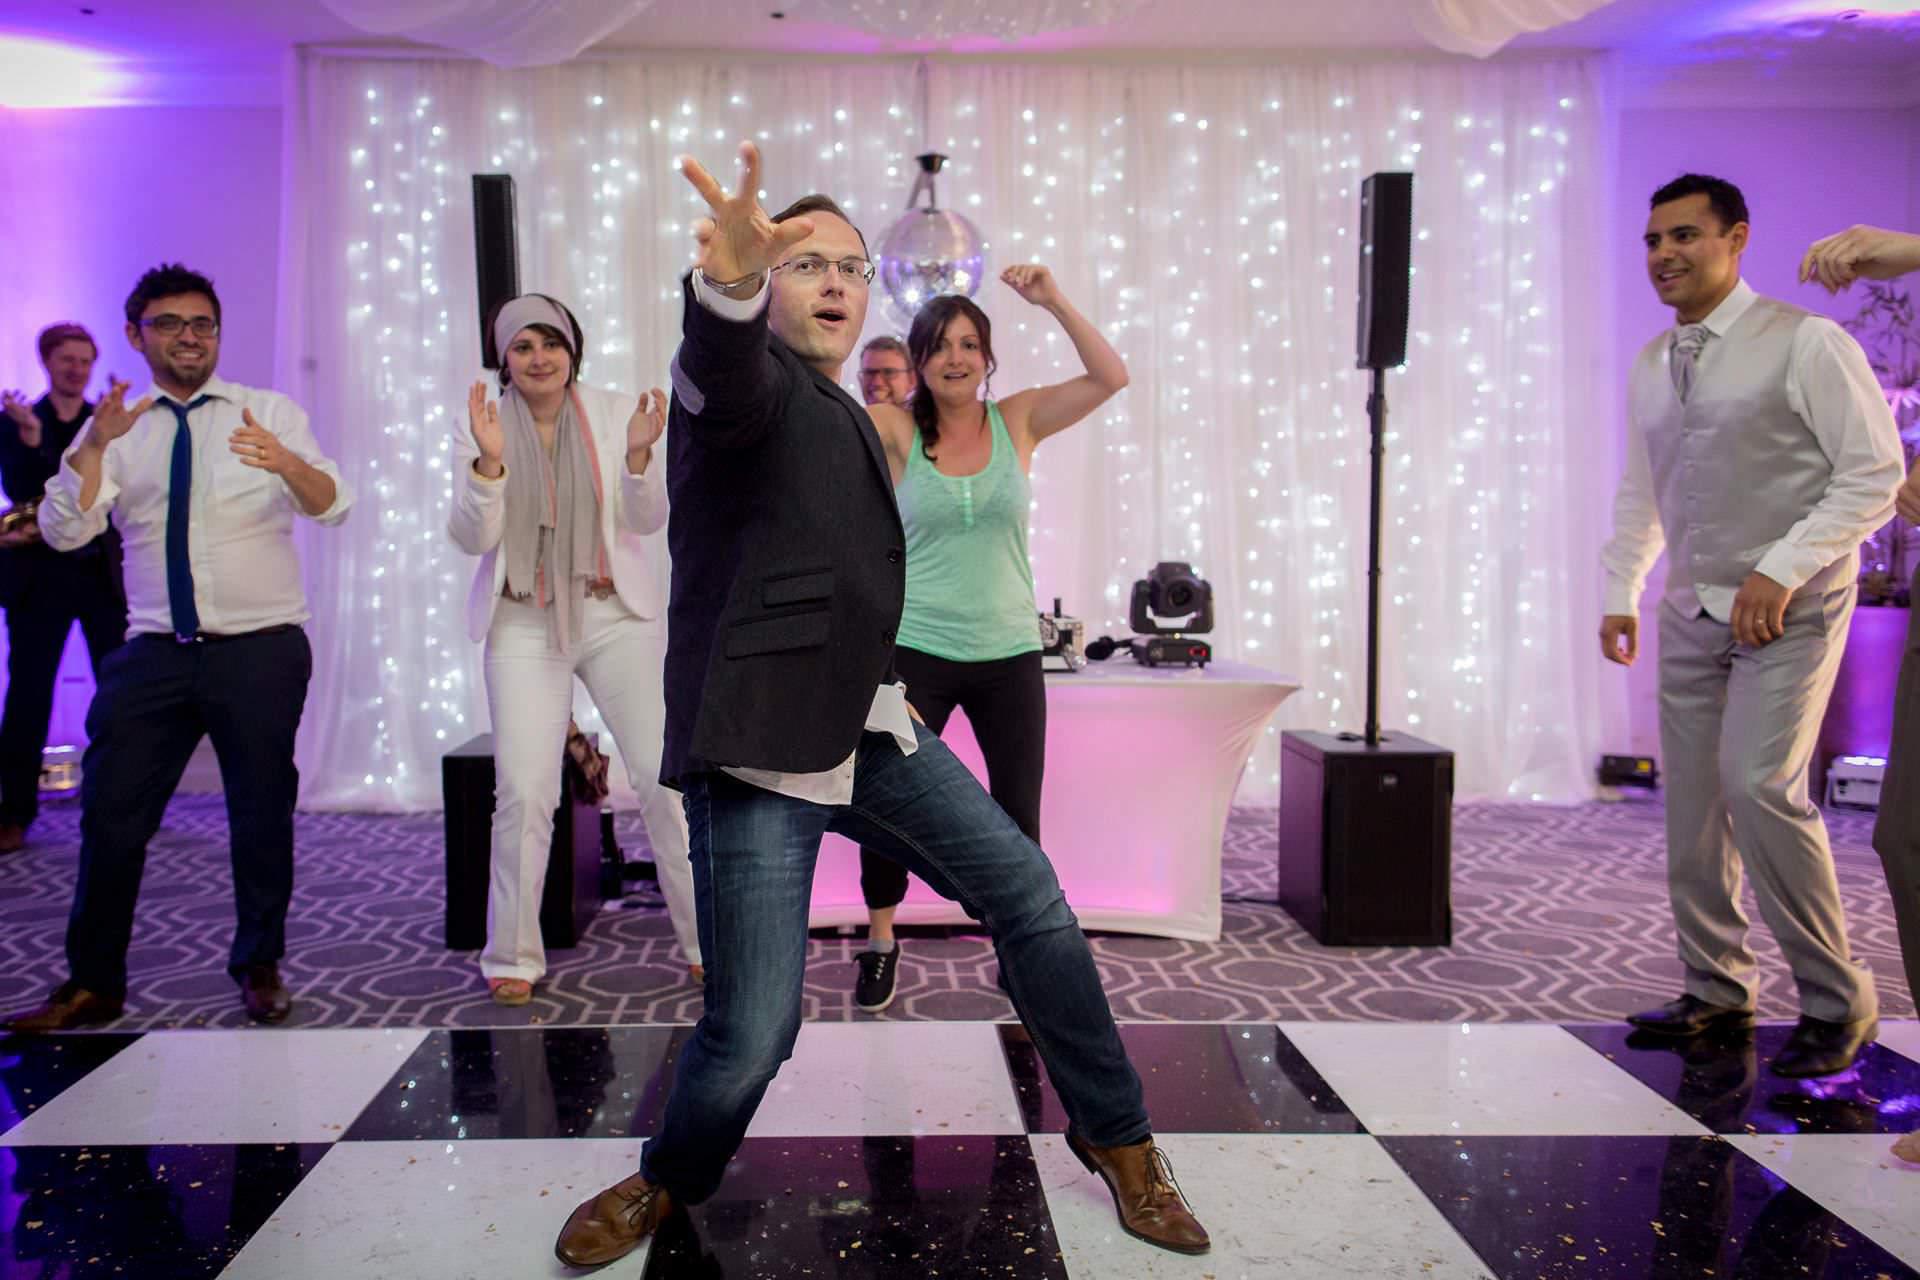 Wotton House wedding friends dance performance